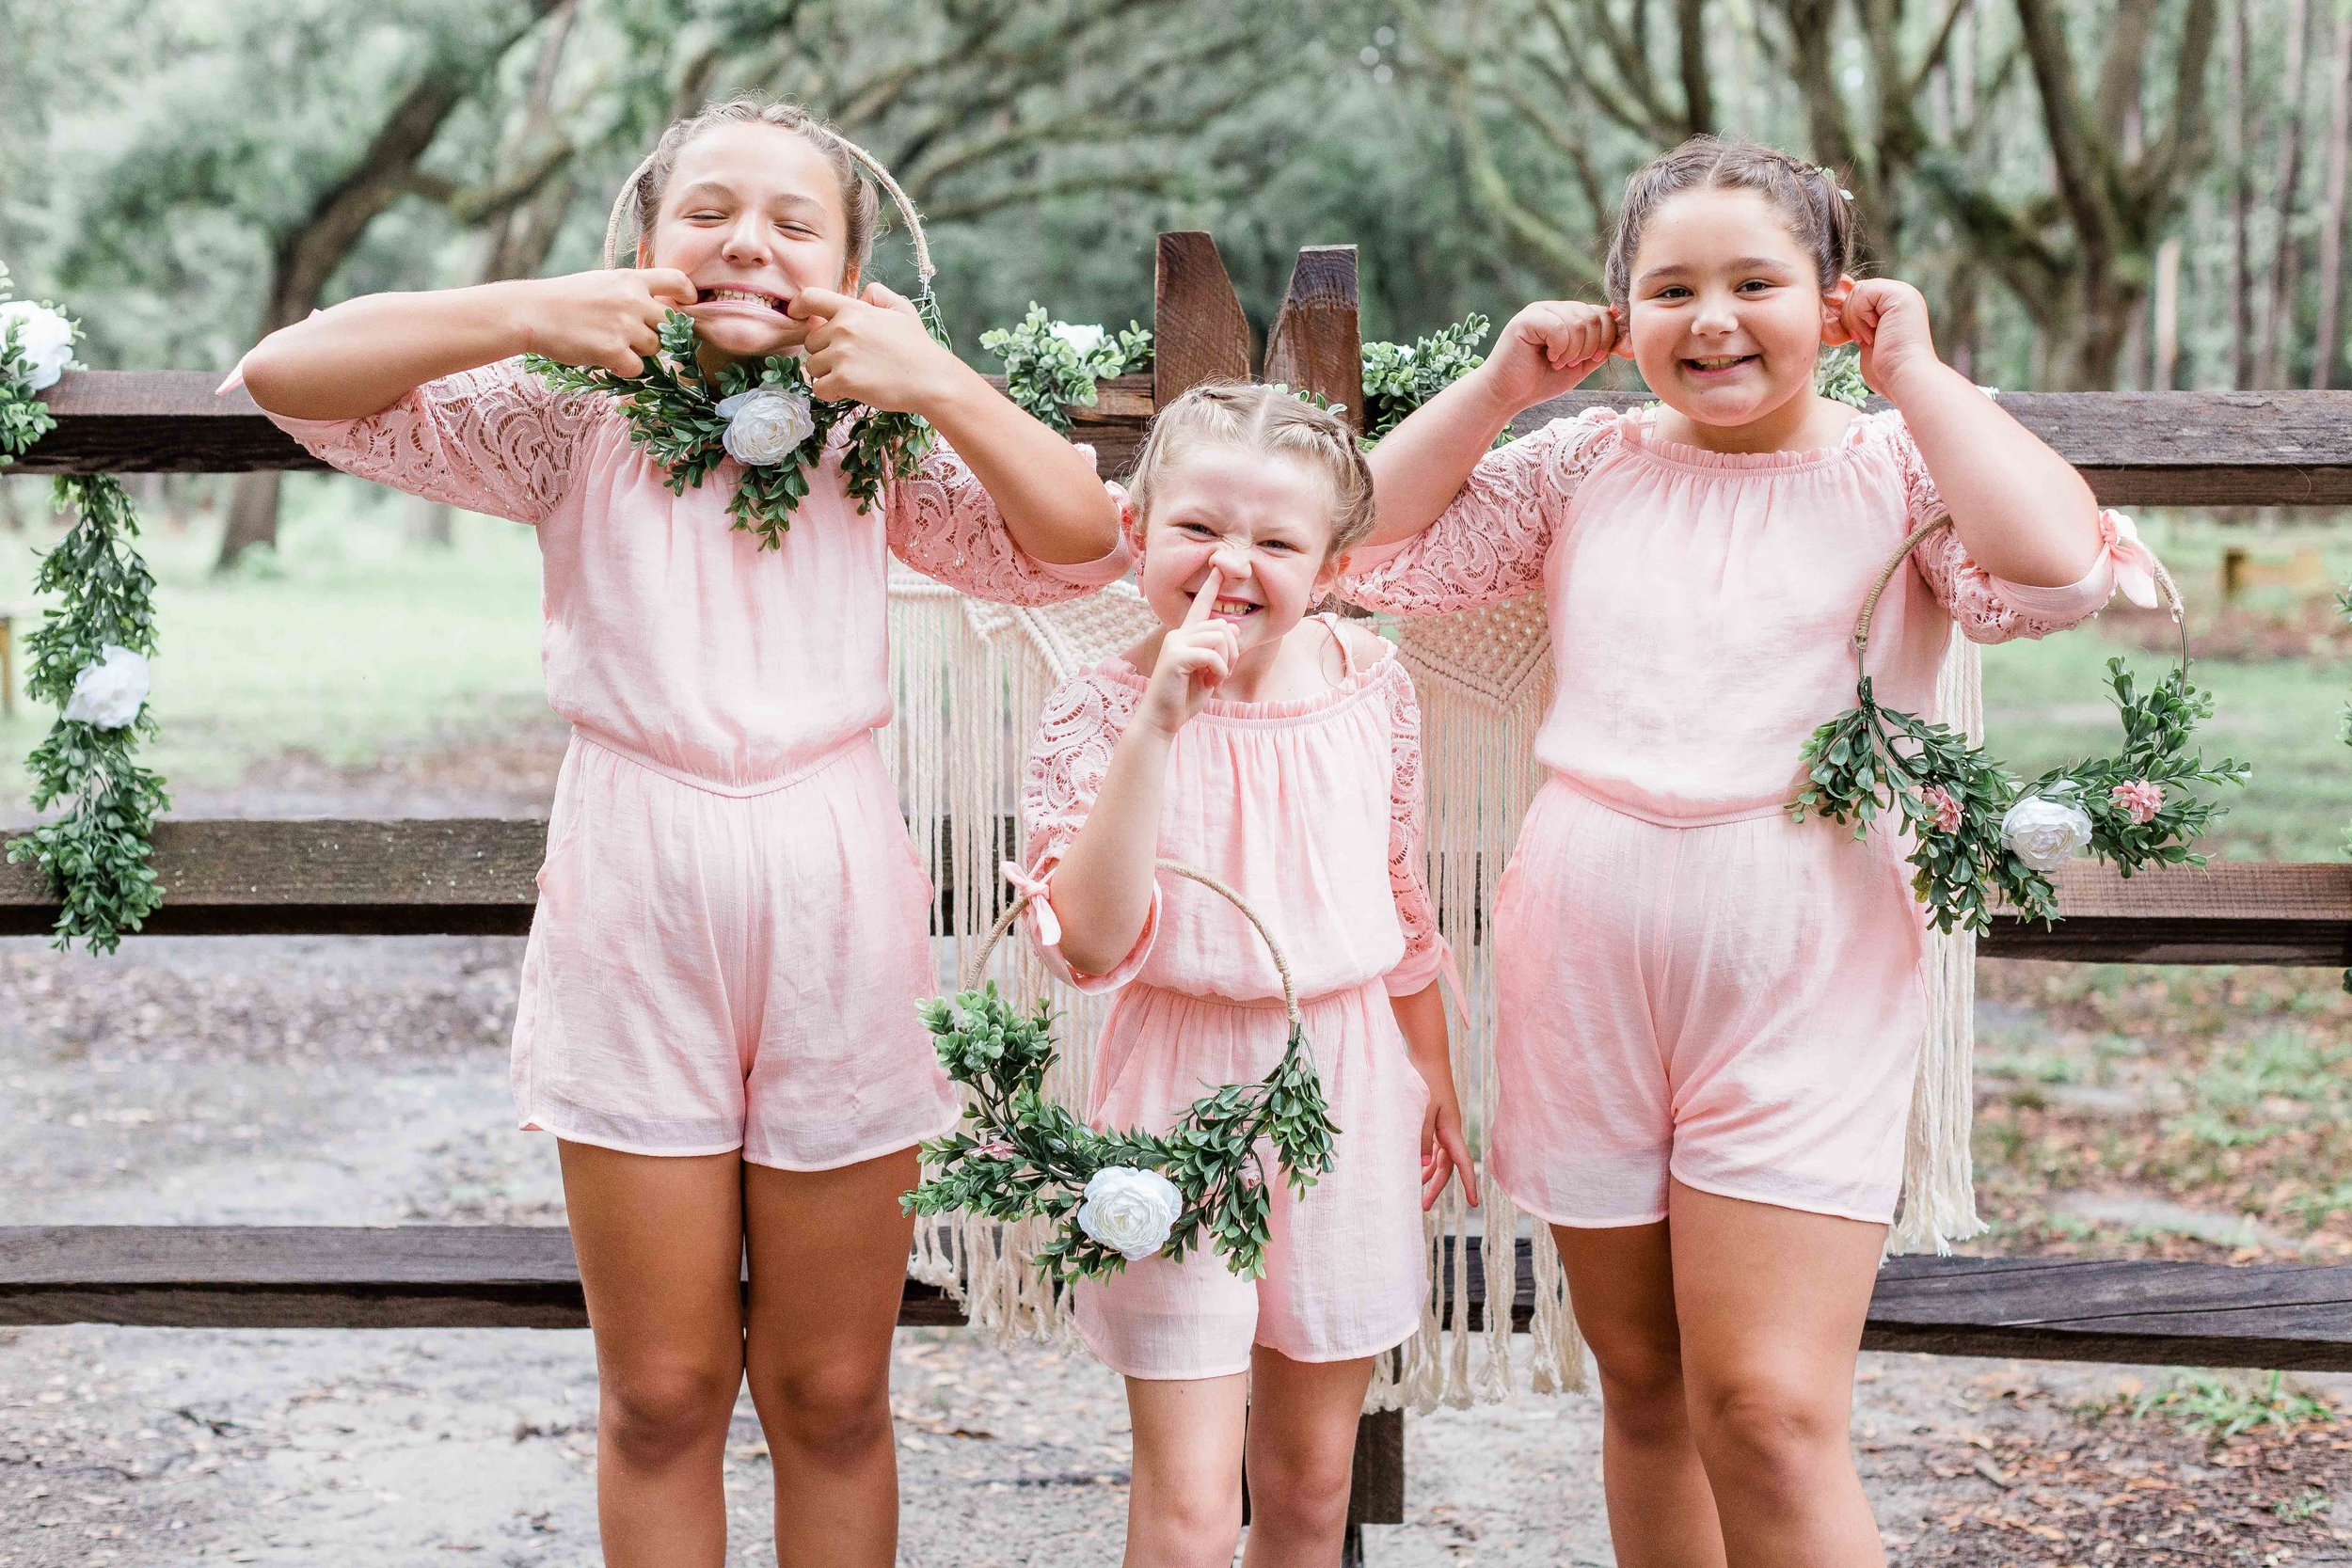 20190727Georgia-Wormlsoe Plantation-Simply Eloped-Savannah Wedding Photographer- Southern Lens Photography08.jpg